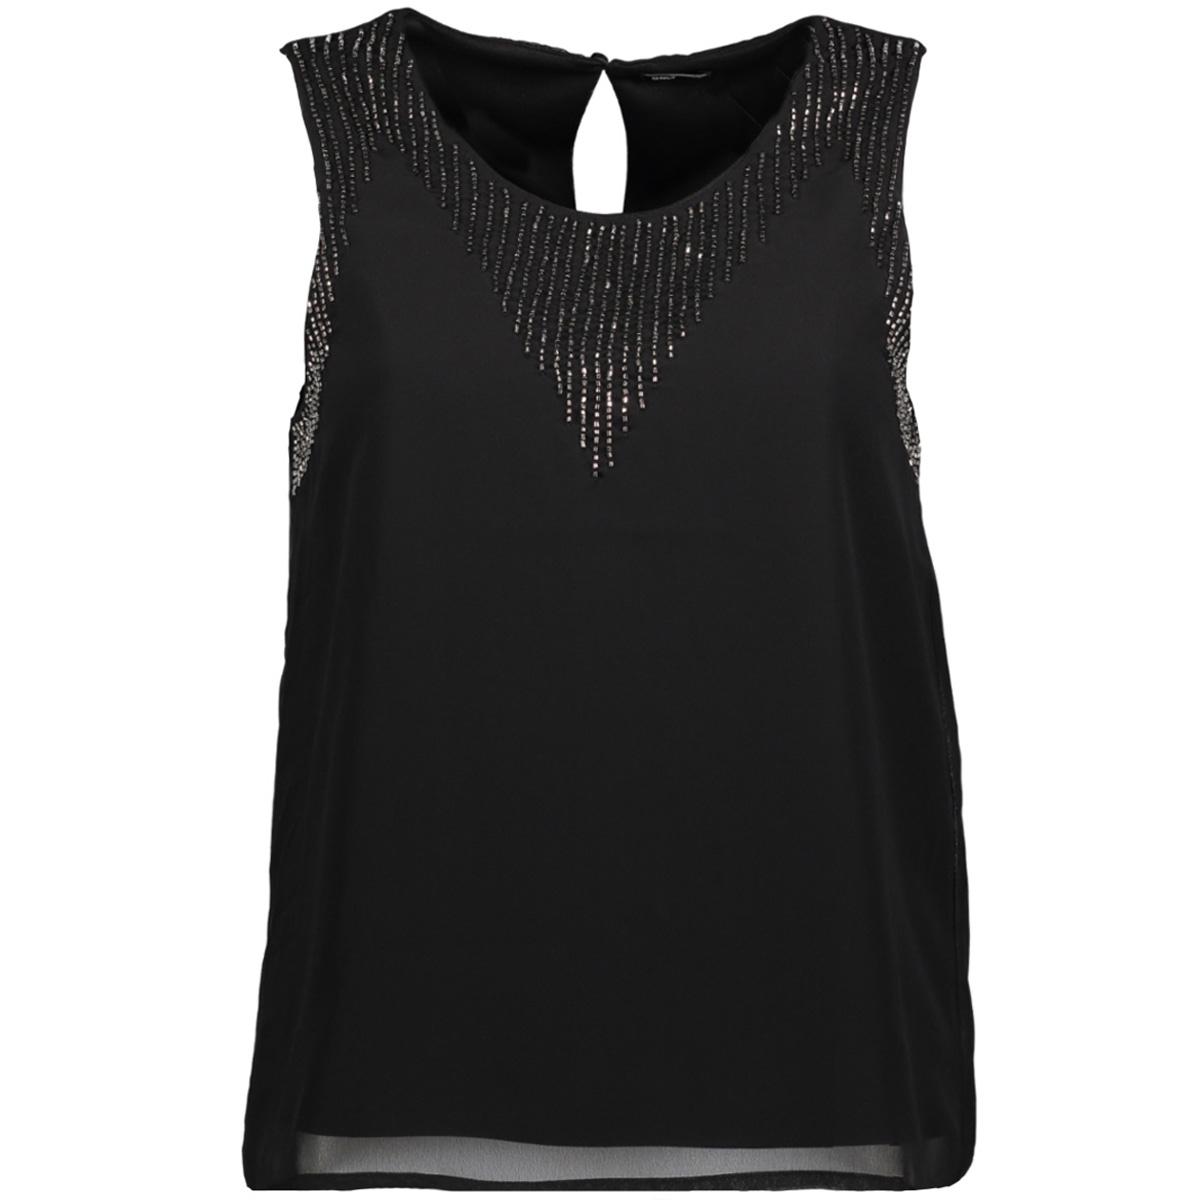 onlkaja s/l bead top wvn 15142656 only top black